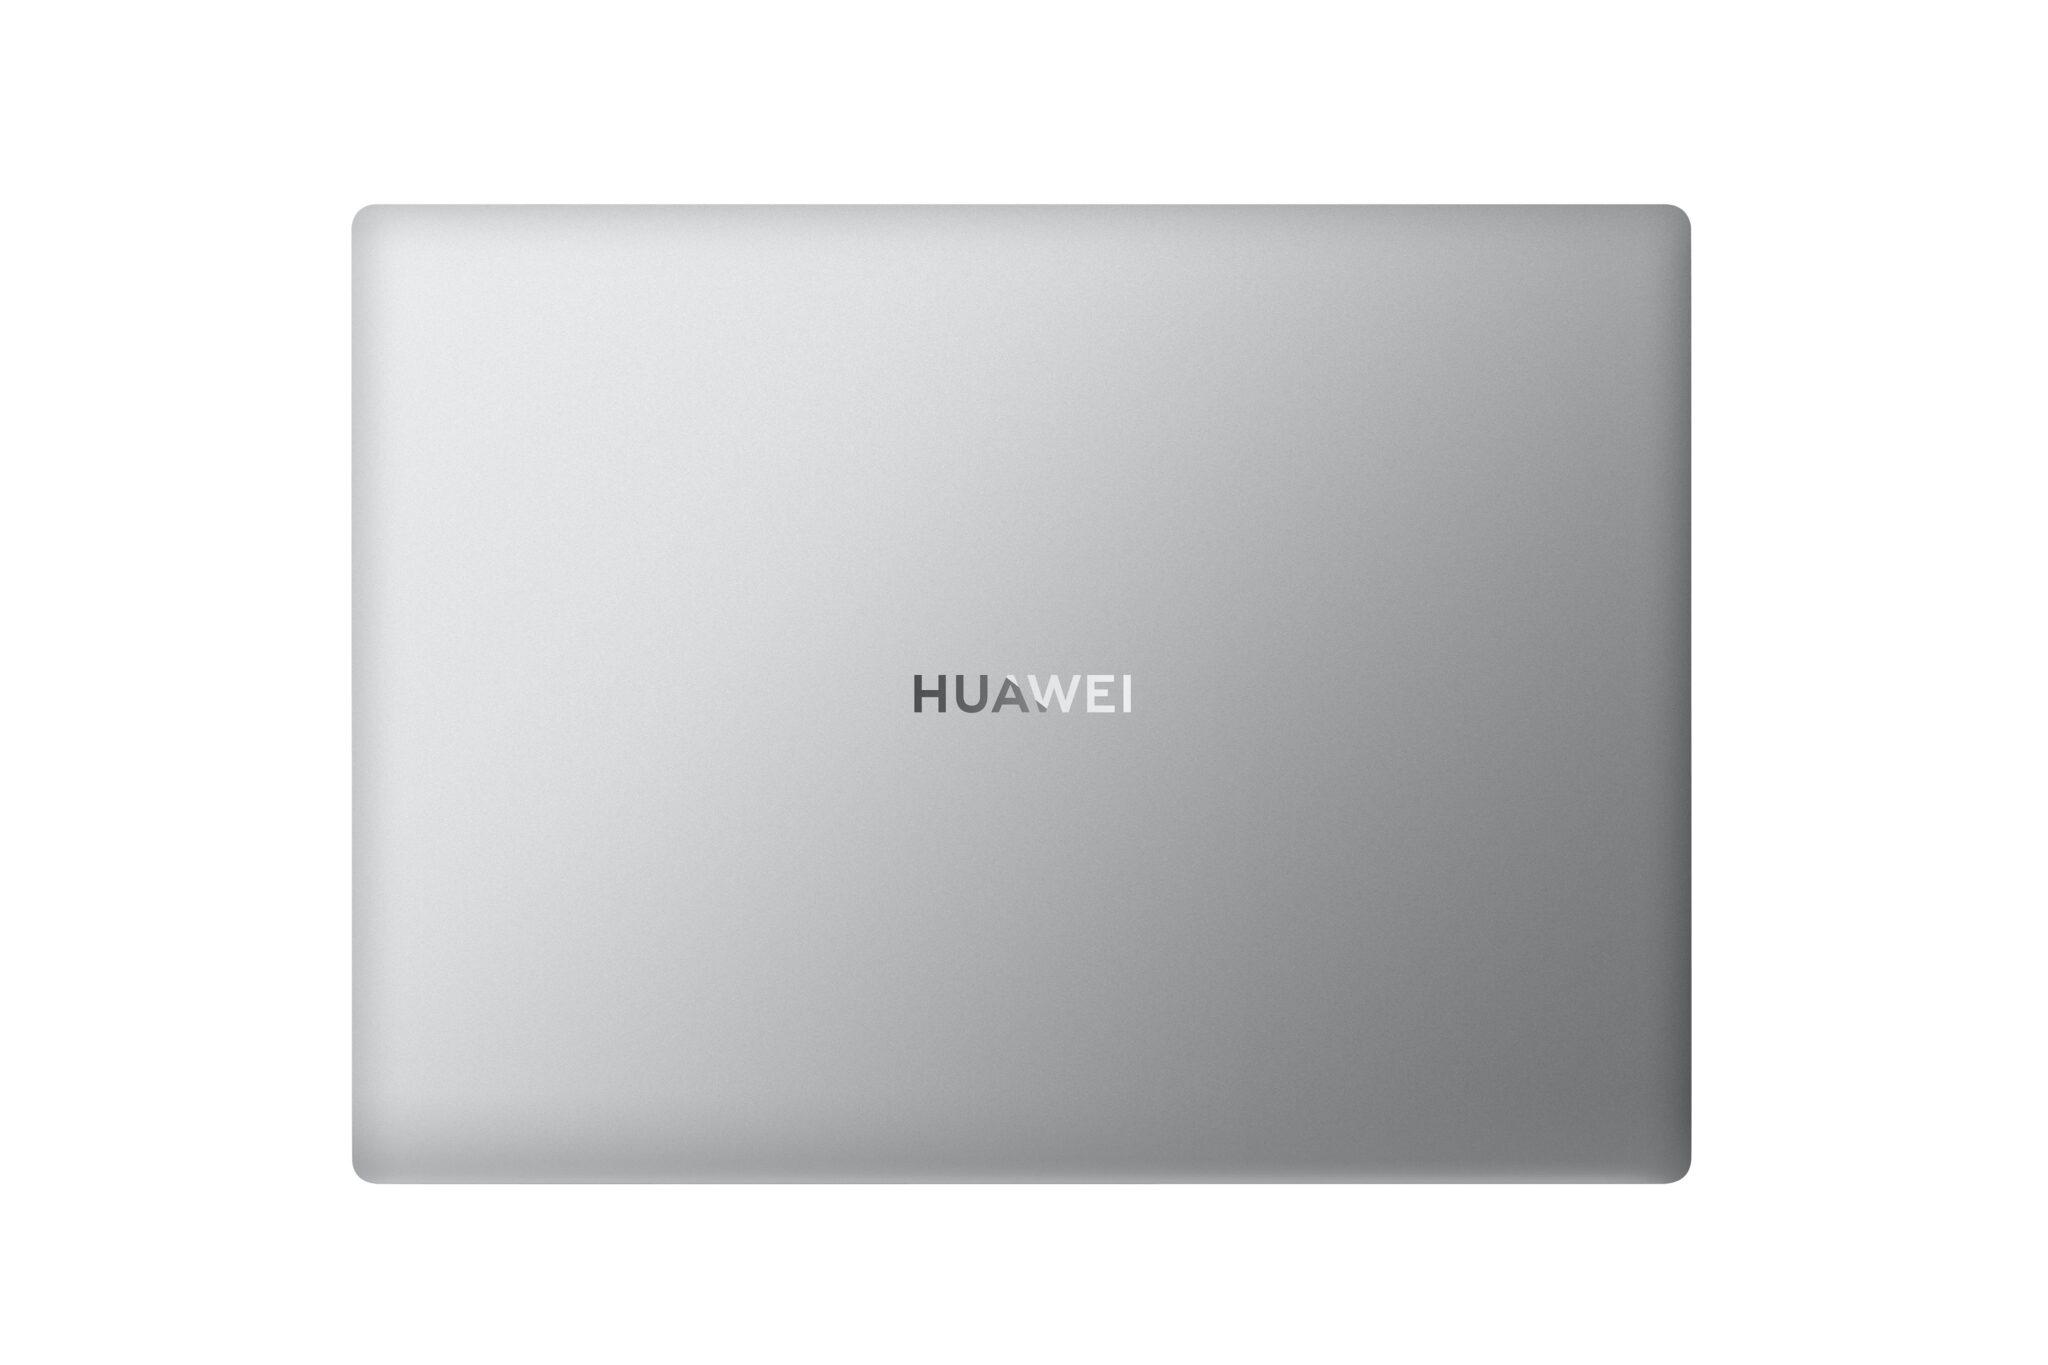 Huawei Matebook 14 tapa cerrada scaled